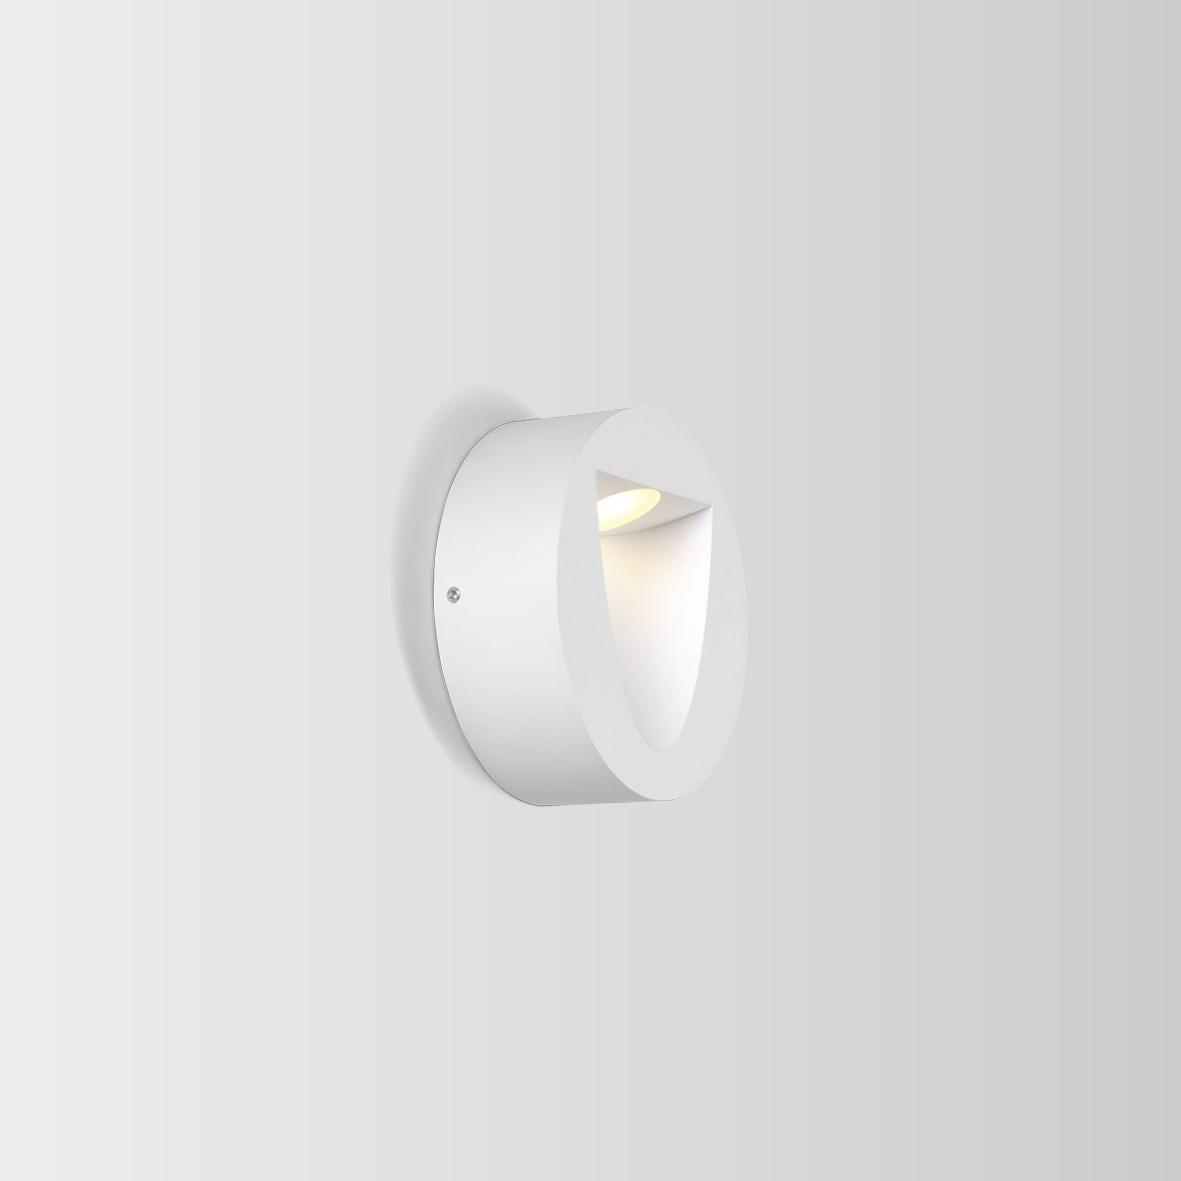 Wever & Ducré+SMILE ON 1.0 LED 3000K VALGE 6W 80CRI 220-240VAC, välisvalgusti seinale